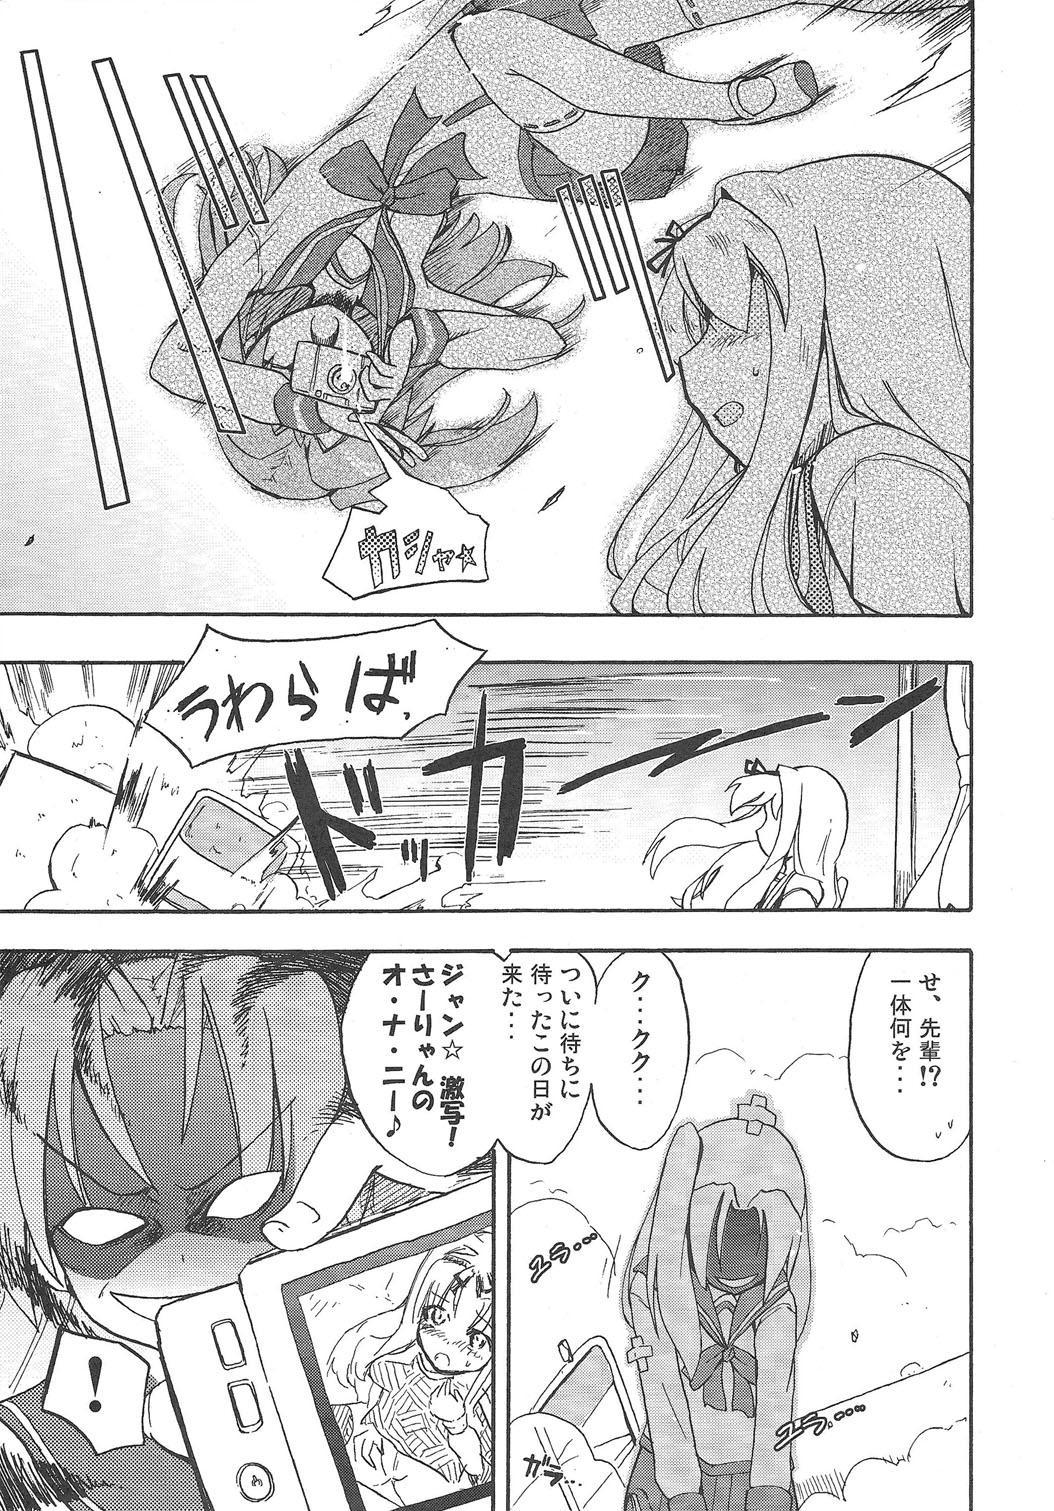 Homuraya Milk ★ Collection 37